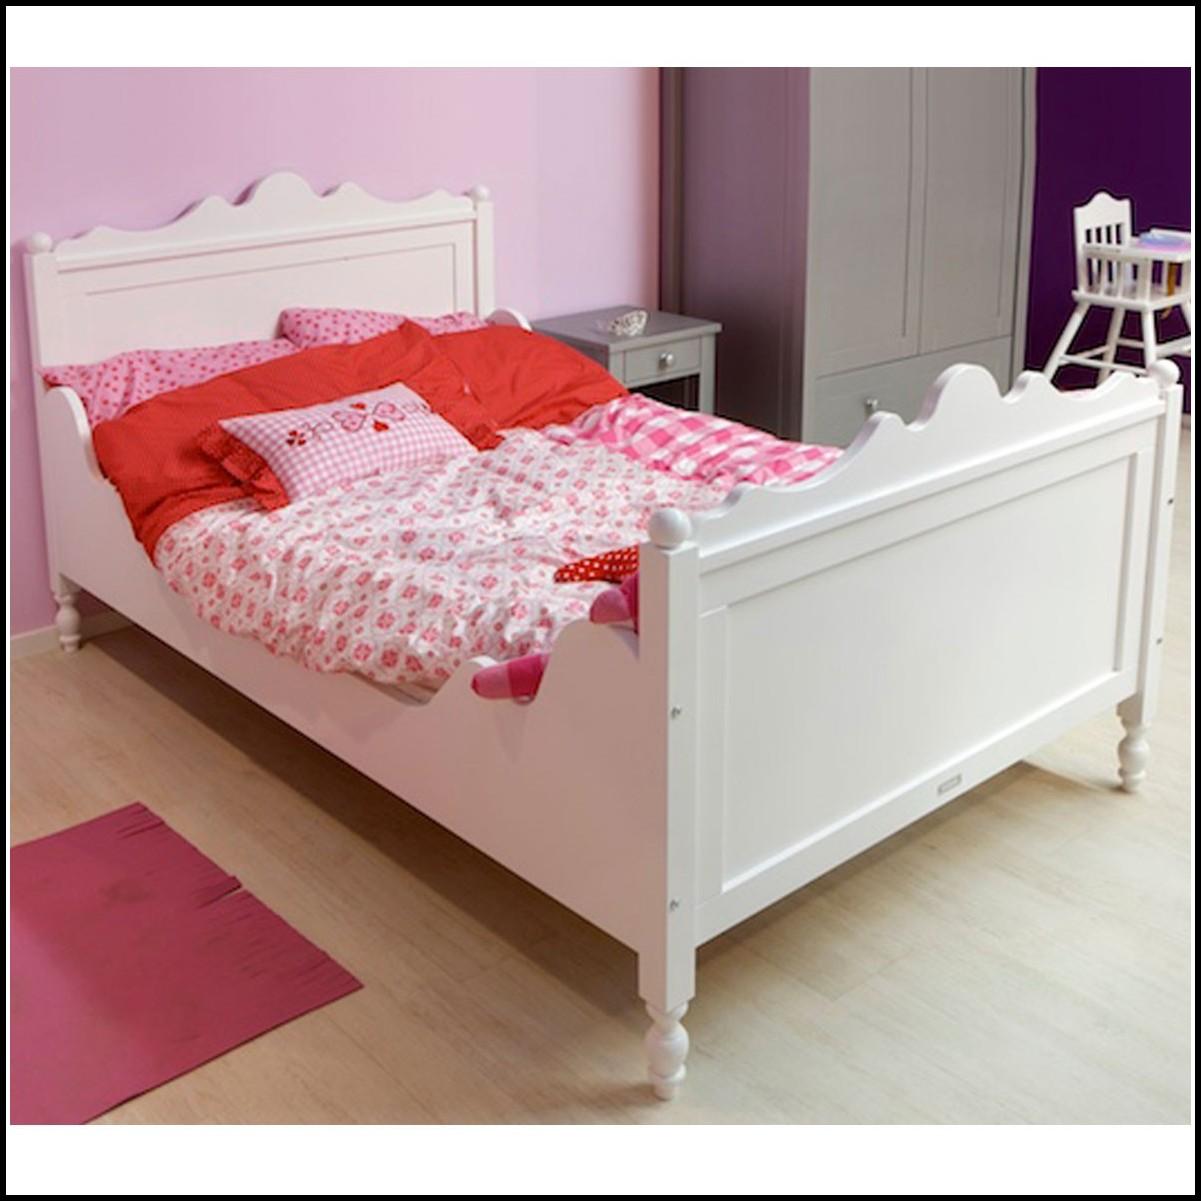 bett 120 x 200 betten house und dekor galerie re1lj4dk2p. Black Bedroom Furniture Sets. Home Design Ideas